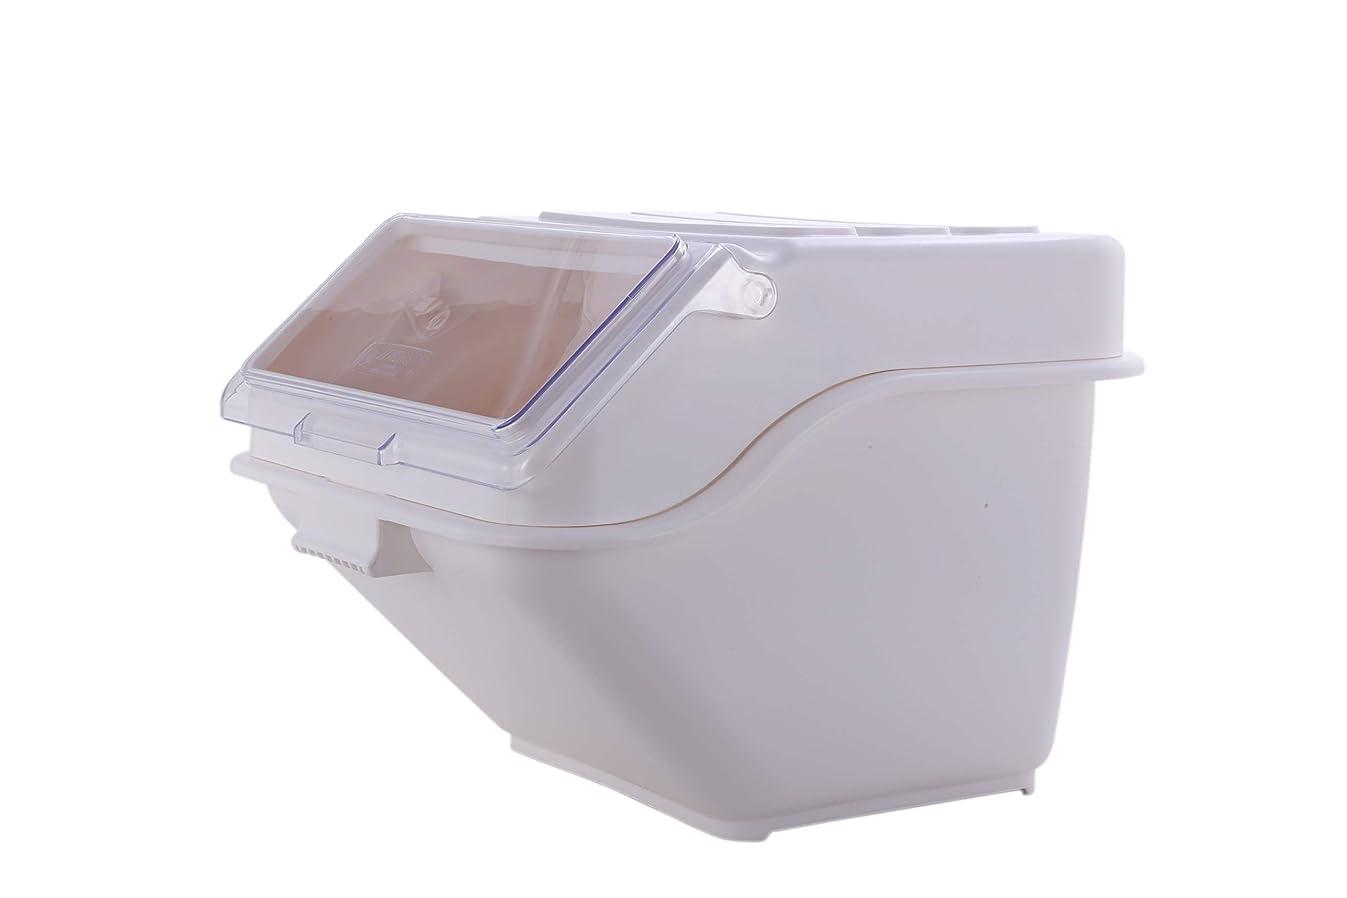 Hakka Commercial 200-cup ProSave Shelf-Storage Ingredient Bin with Scoop,Stackable